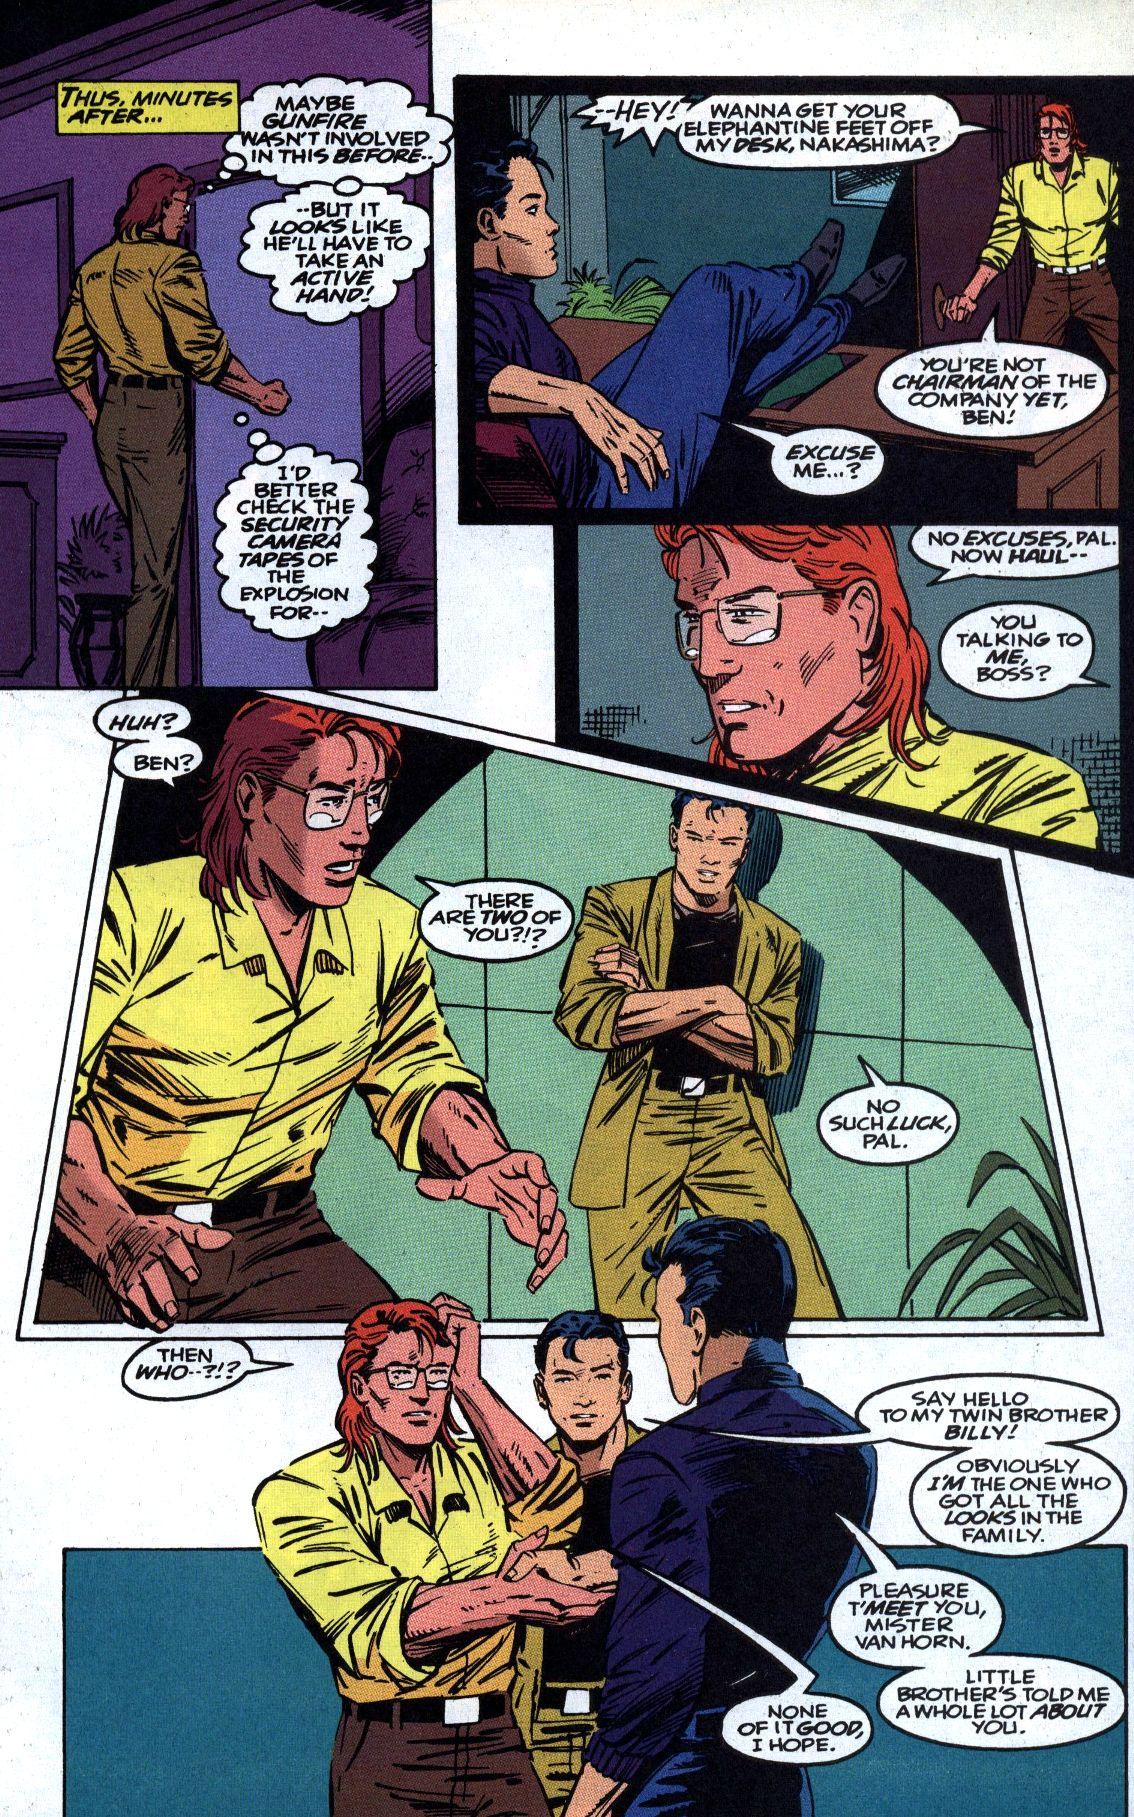 Read online Gunfire comic -  Issue #7 - 11